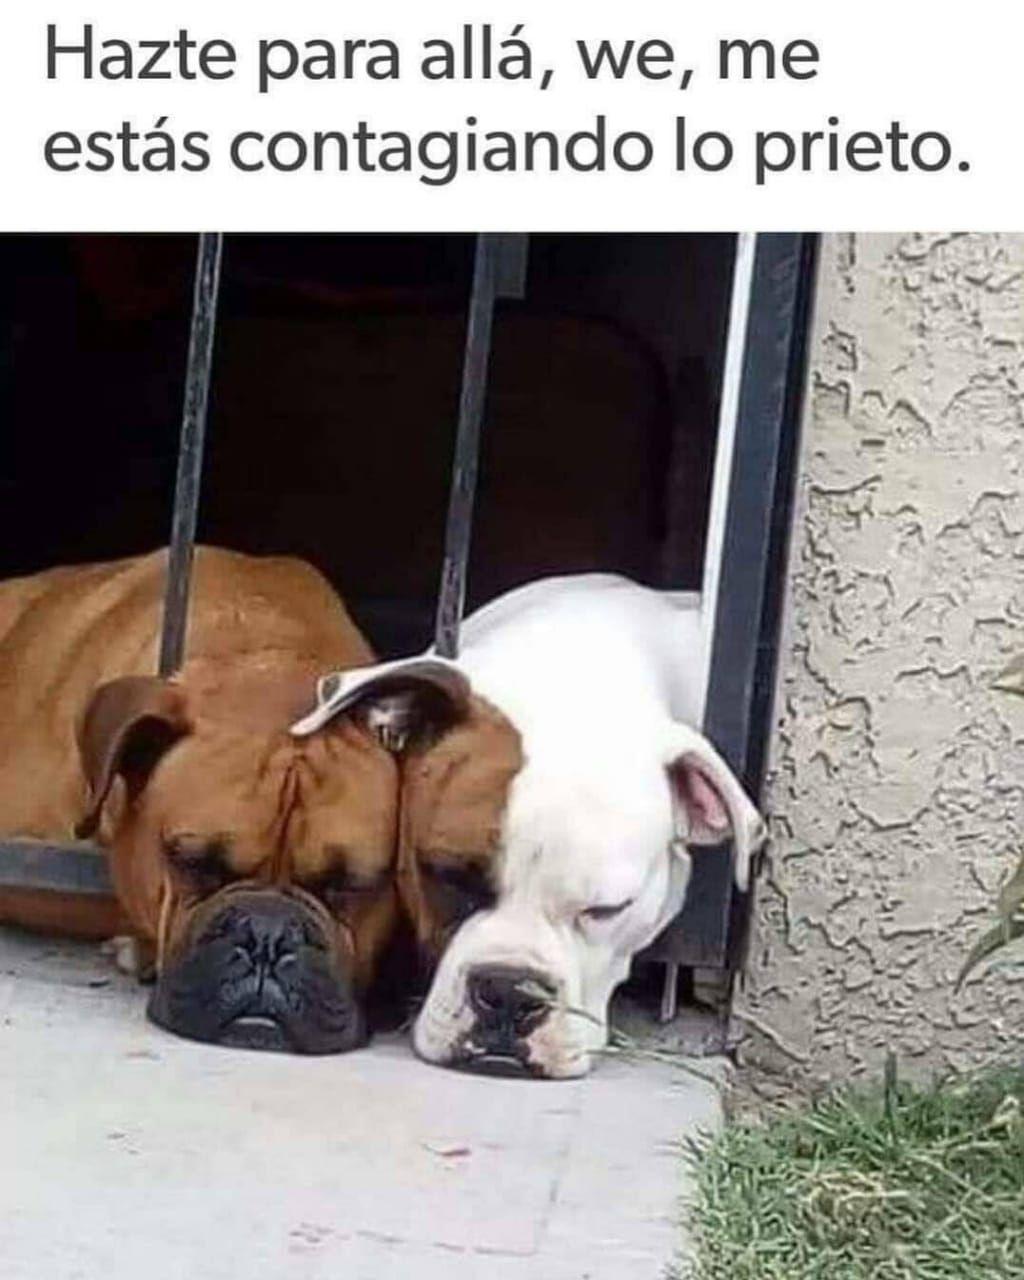 Memes Del Firulais Memes En Espanol La Mejor Recopilacion De Memes Lo Mas Viral De Internet Humor Divertido Sobre Animales Memes Divertidos Memes